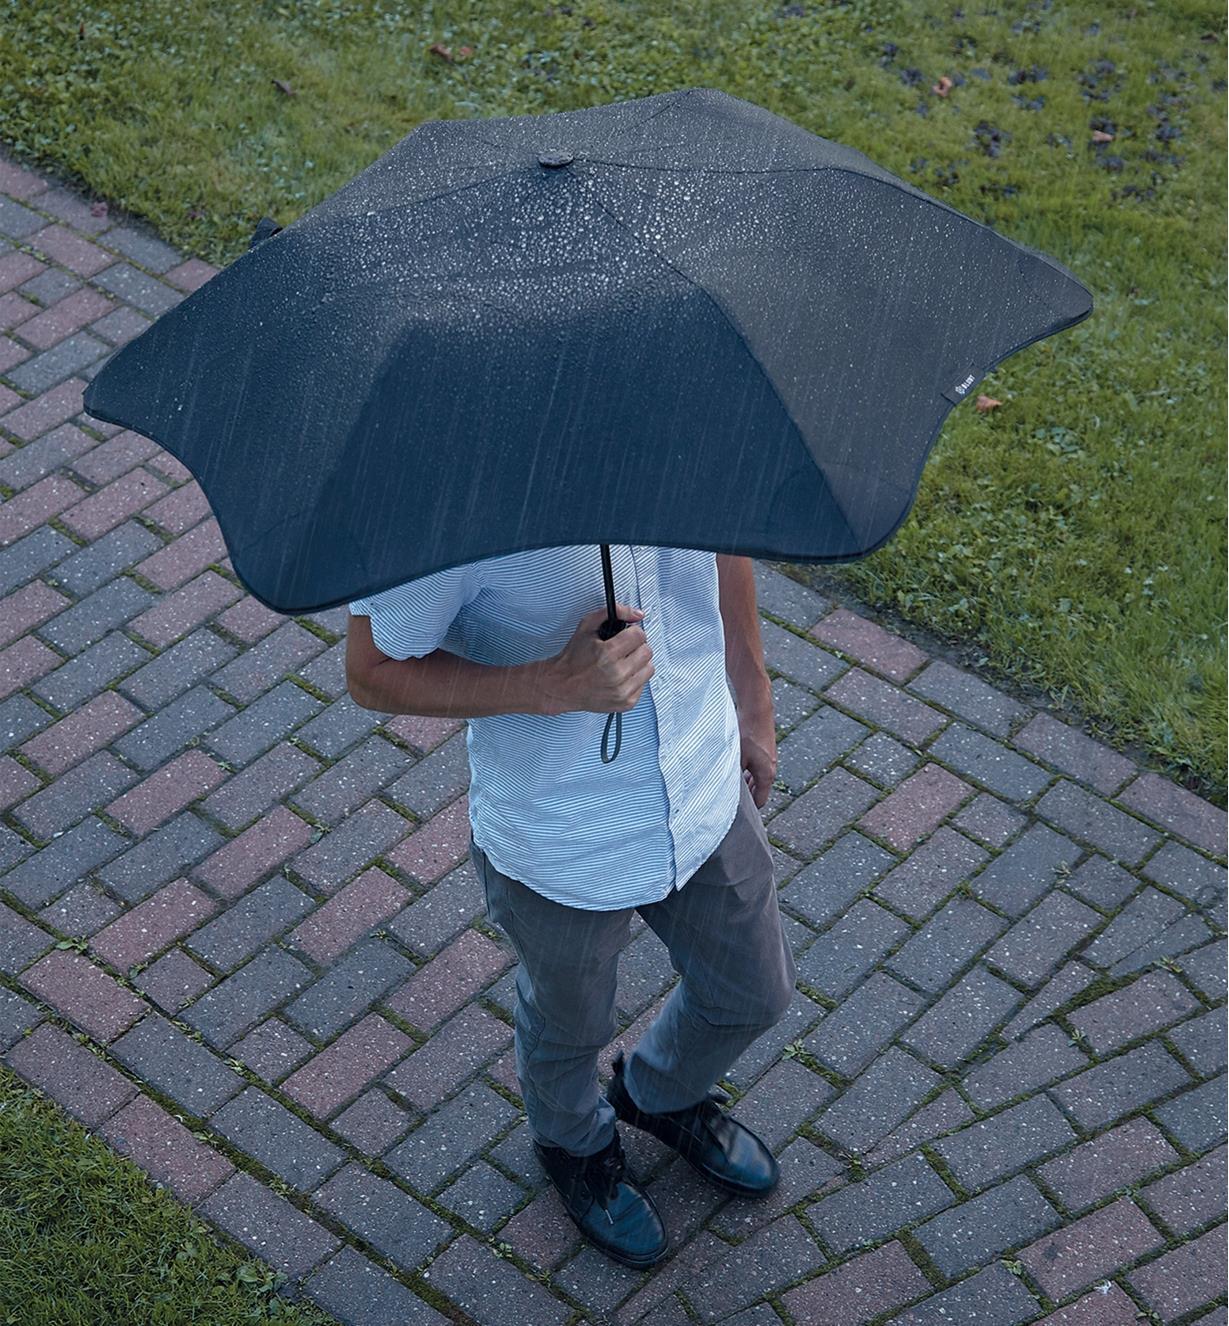 A man walks down a path in the rain carrying an XS Metro Compact Umbrella